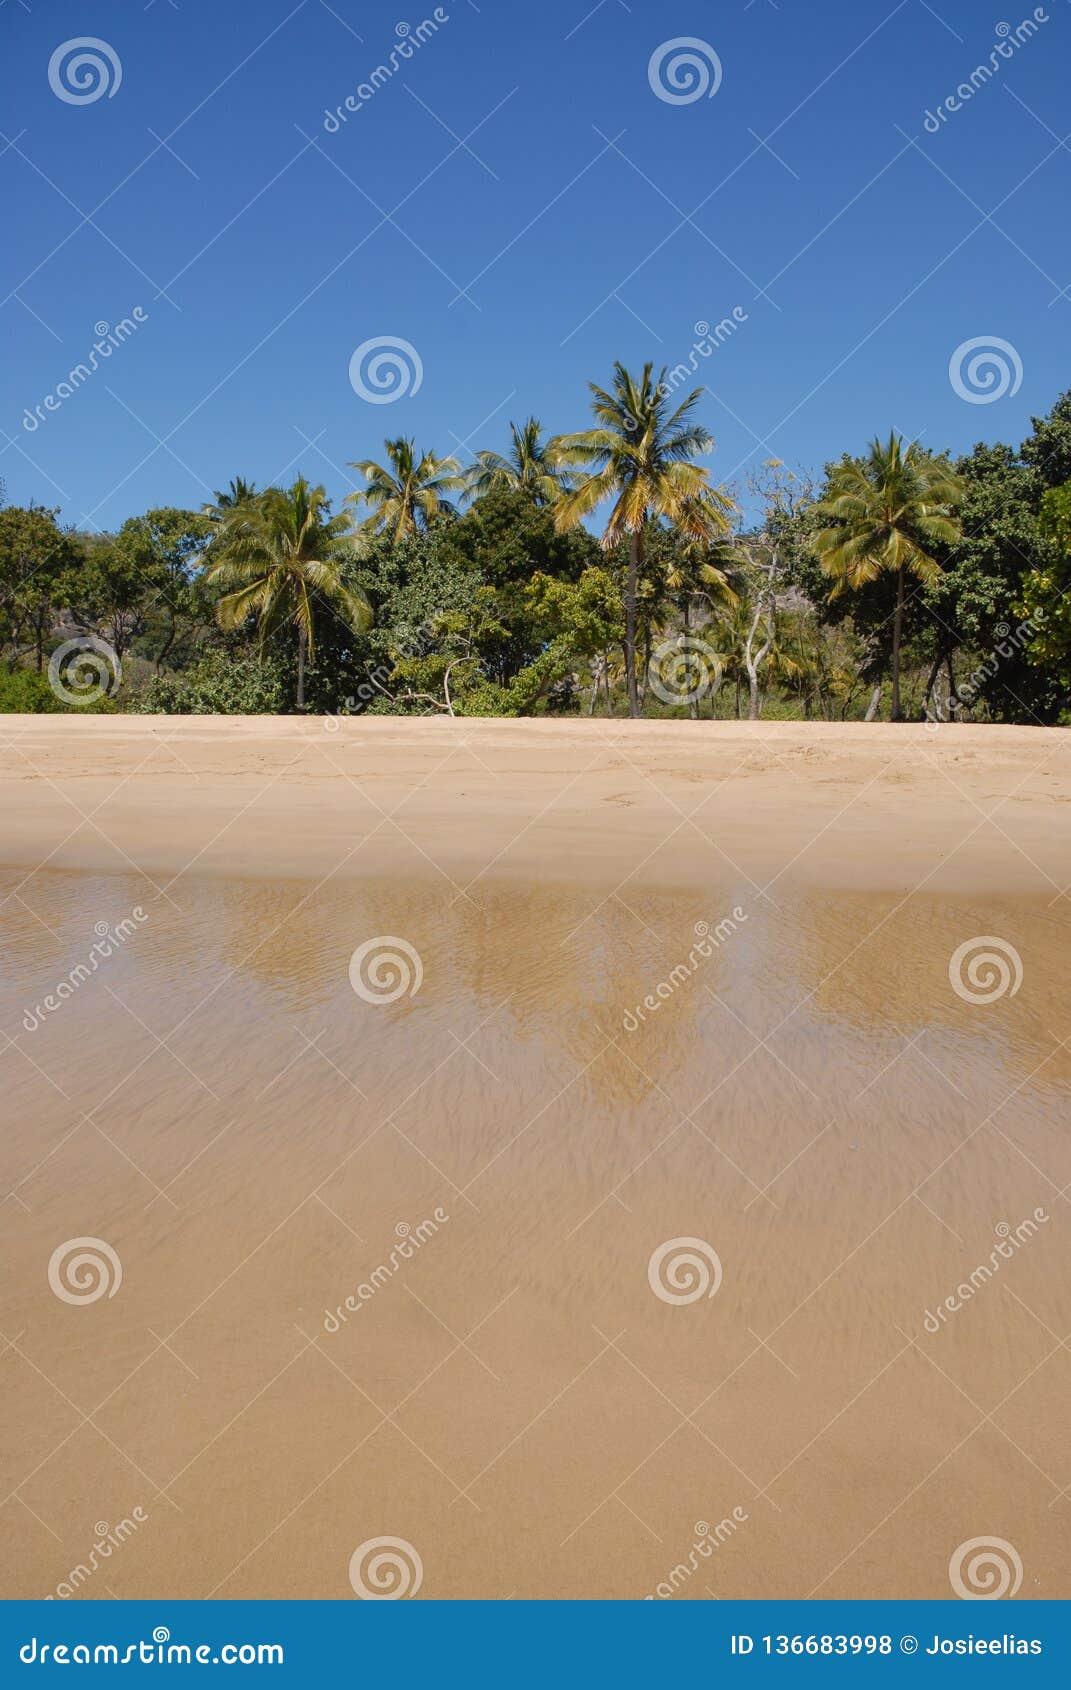 Playa tropical en Queensland del norte lejano, Australia